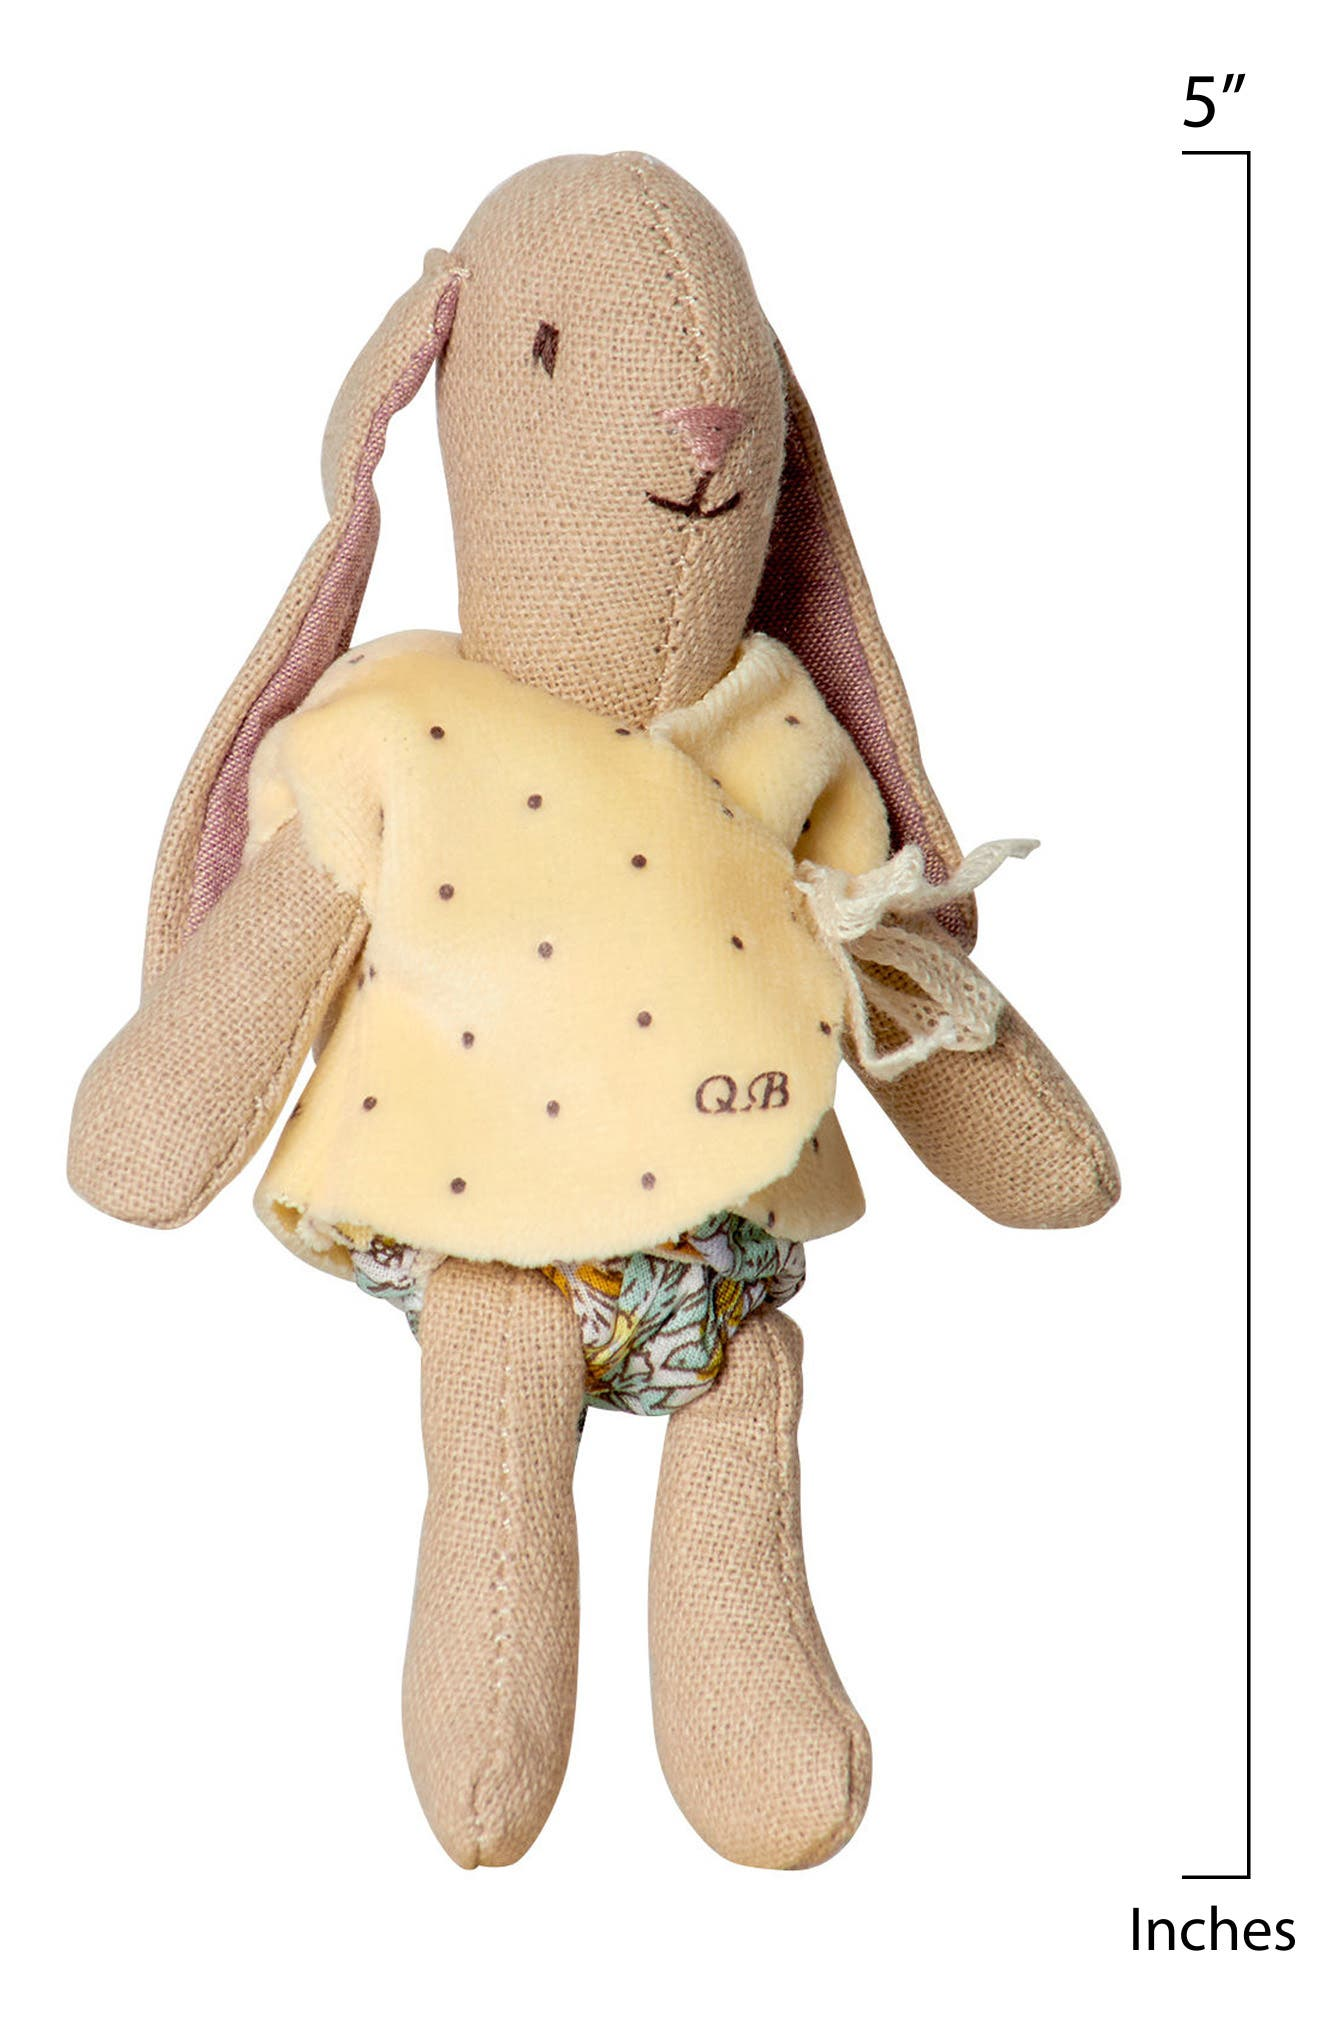 Micro Rabbit Doll Toy,                             Alternate thumbnail 2, color,                             700